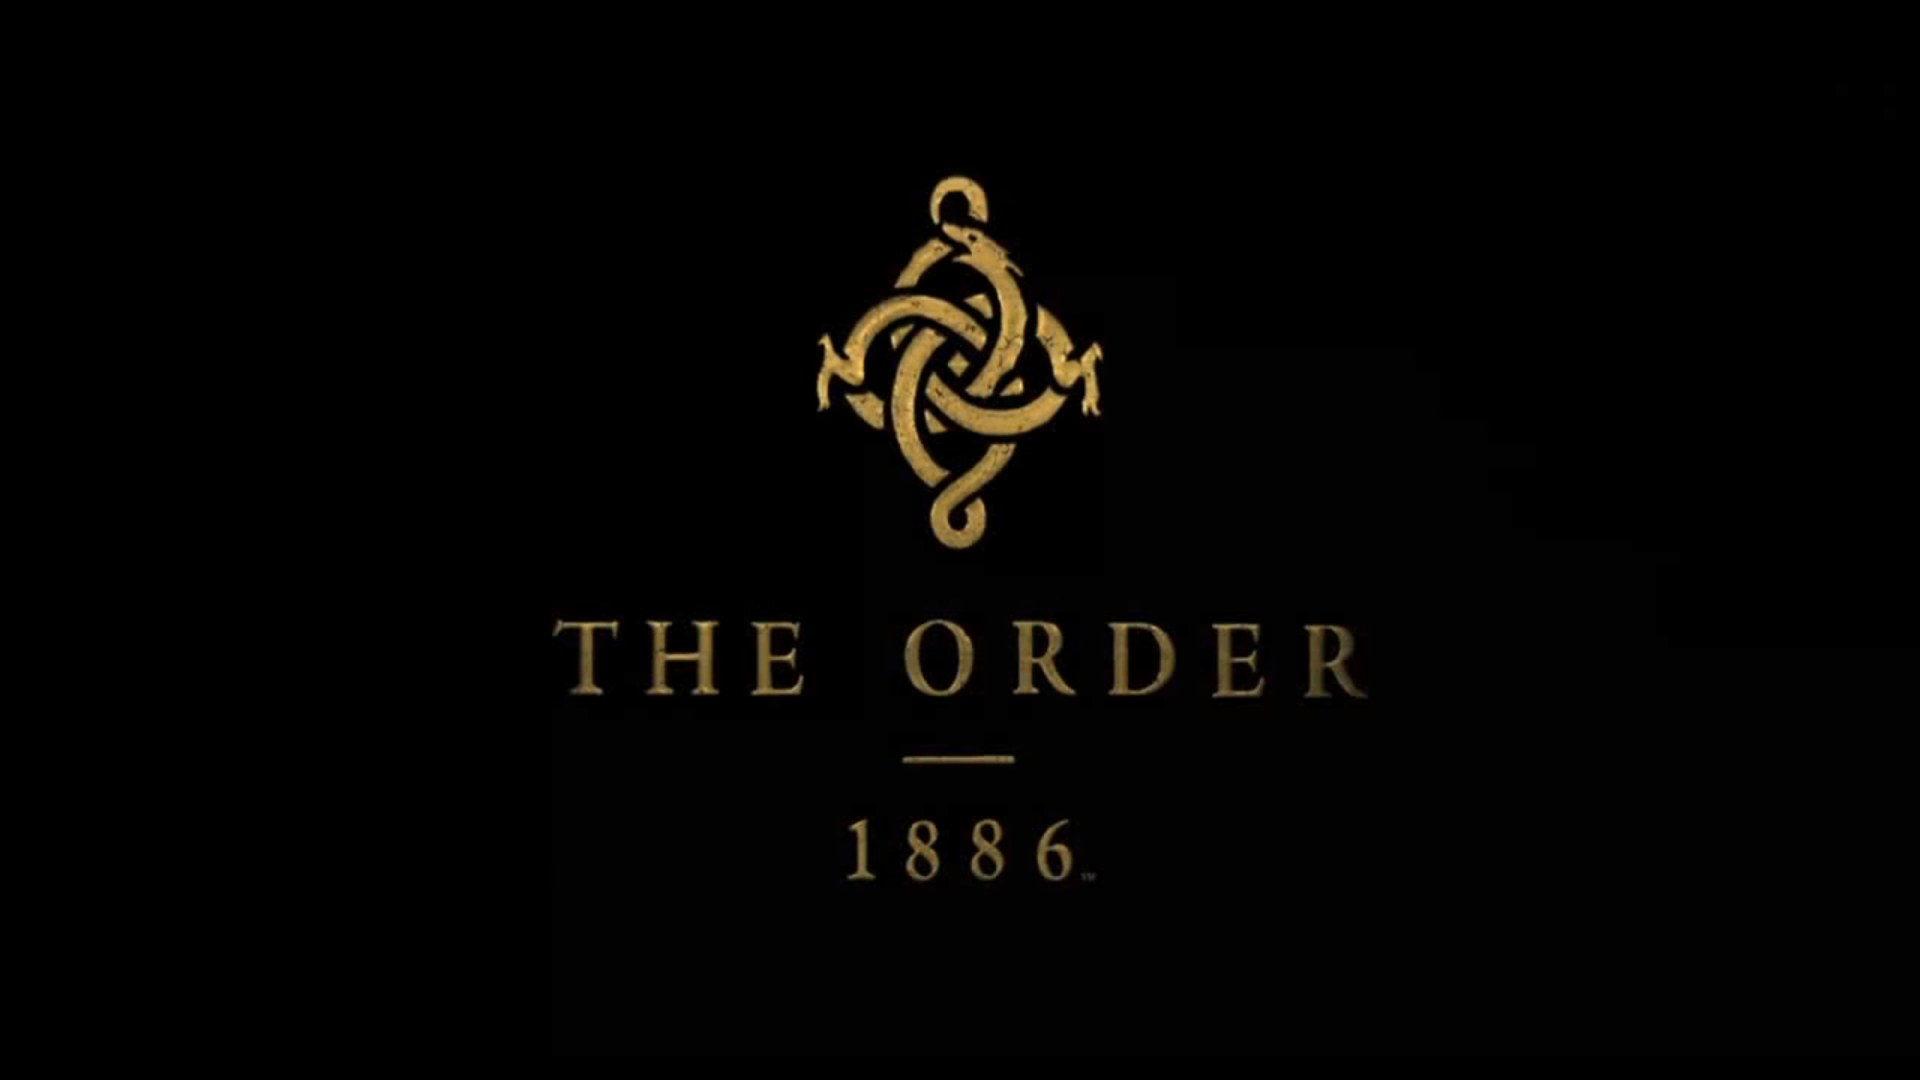 E3 2013: The Order 1886 Details - oprainfall